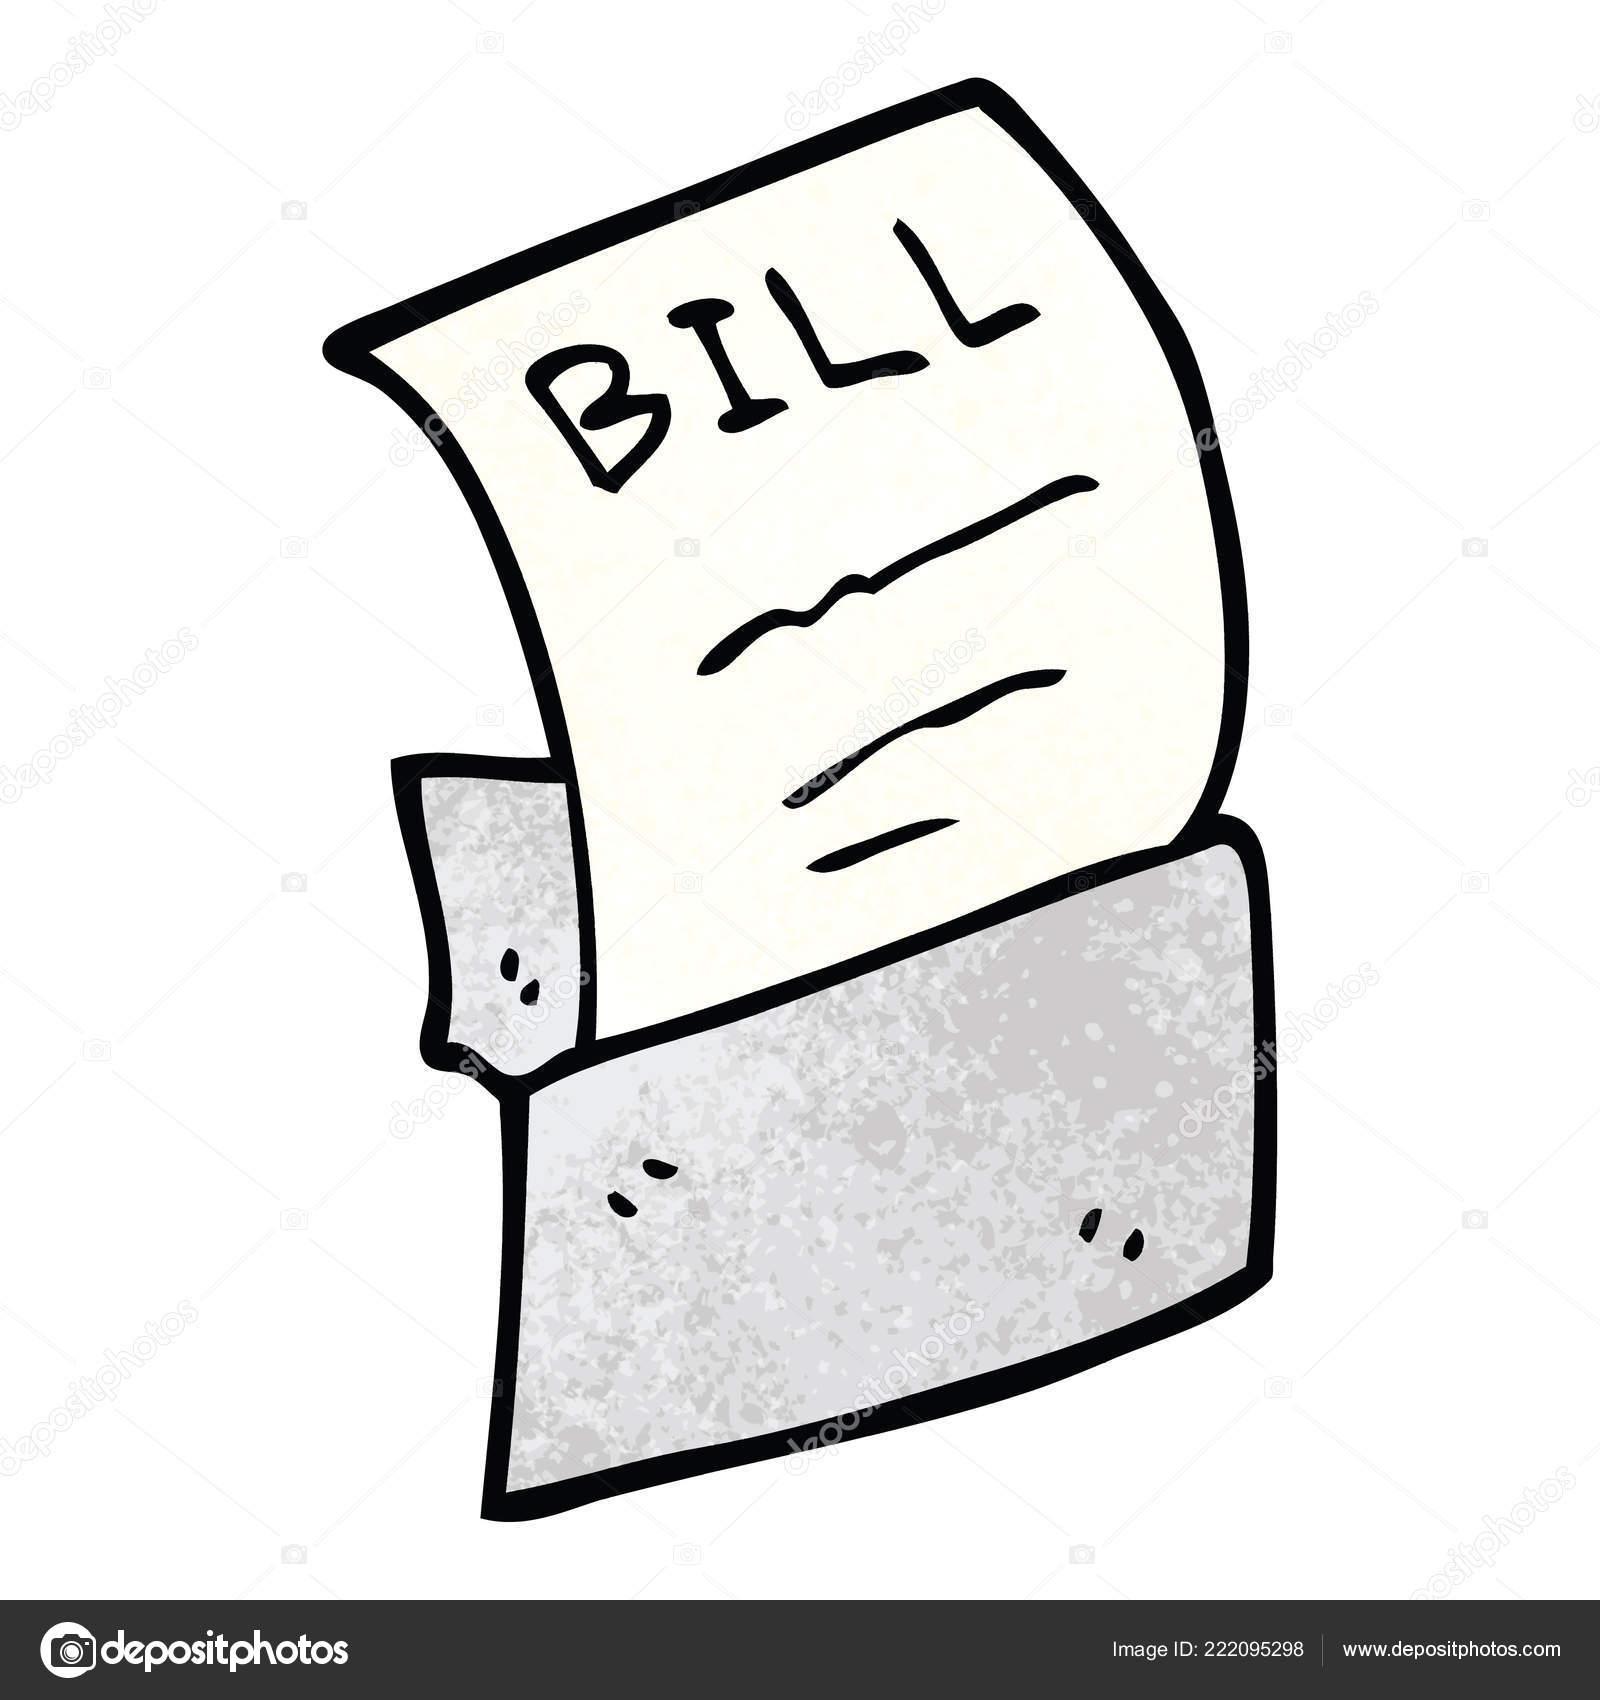 cartoon doodle schulden bill stockvektor. Black Bedroom Furniture Sets. Home Design Ideas